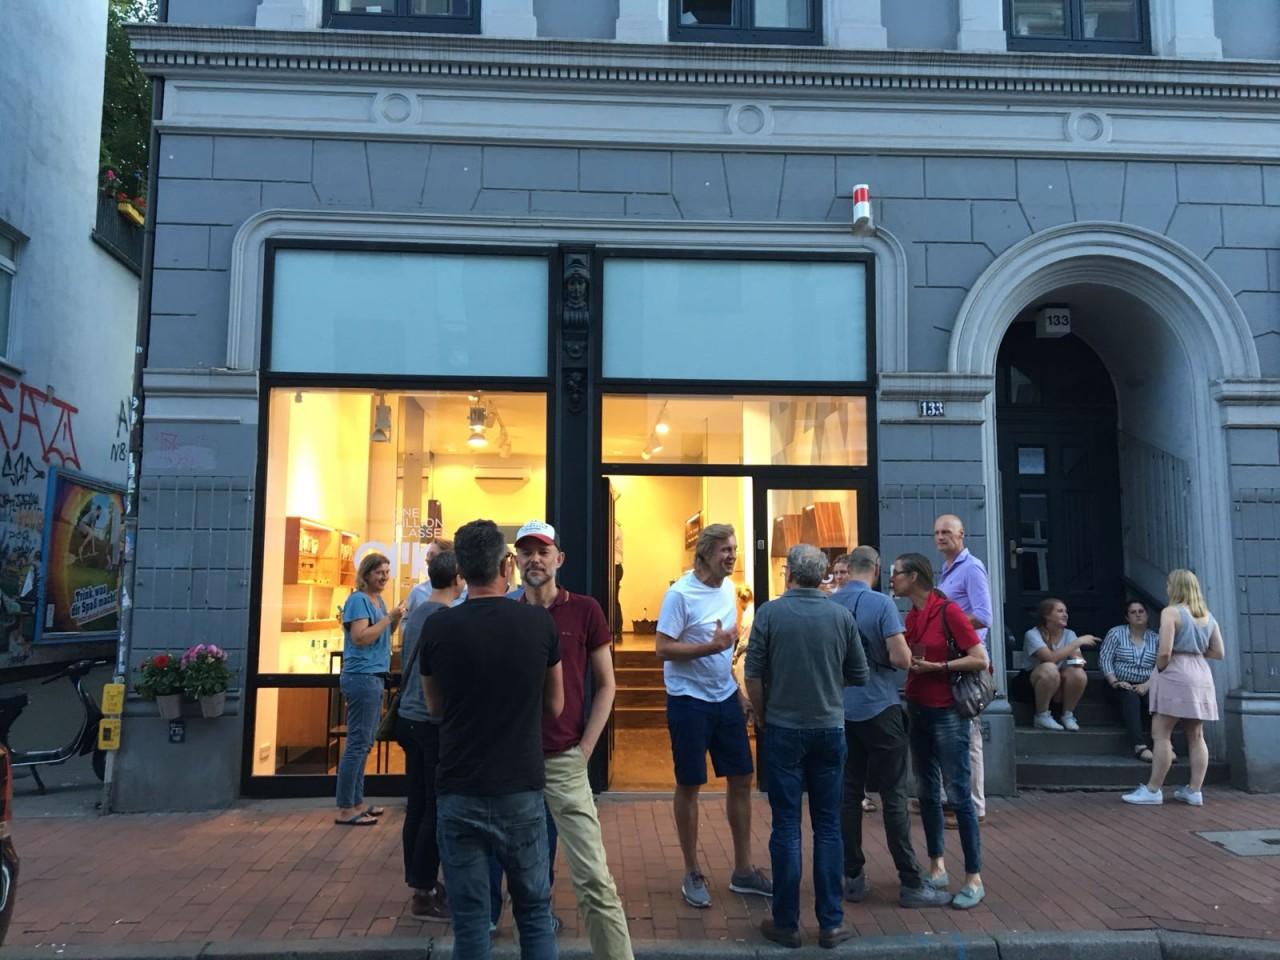 Recap: Storeopening in Ottensen